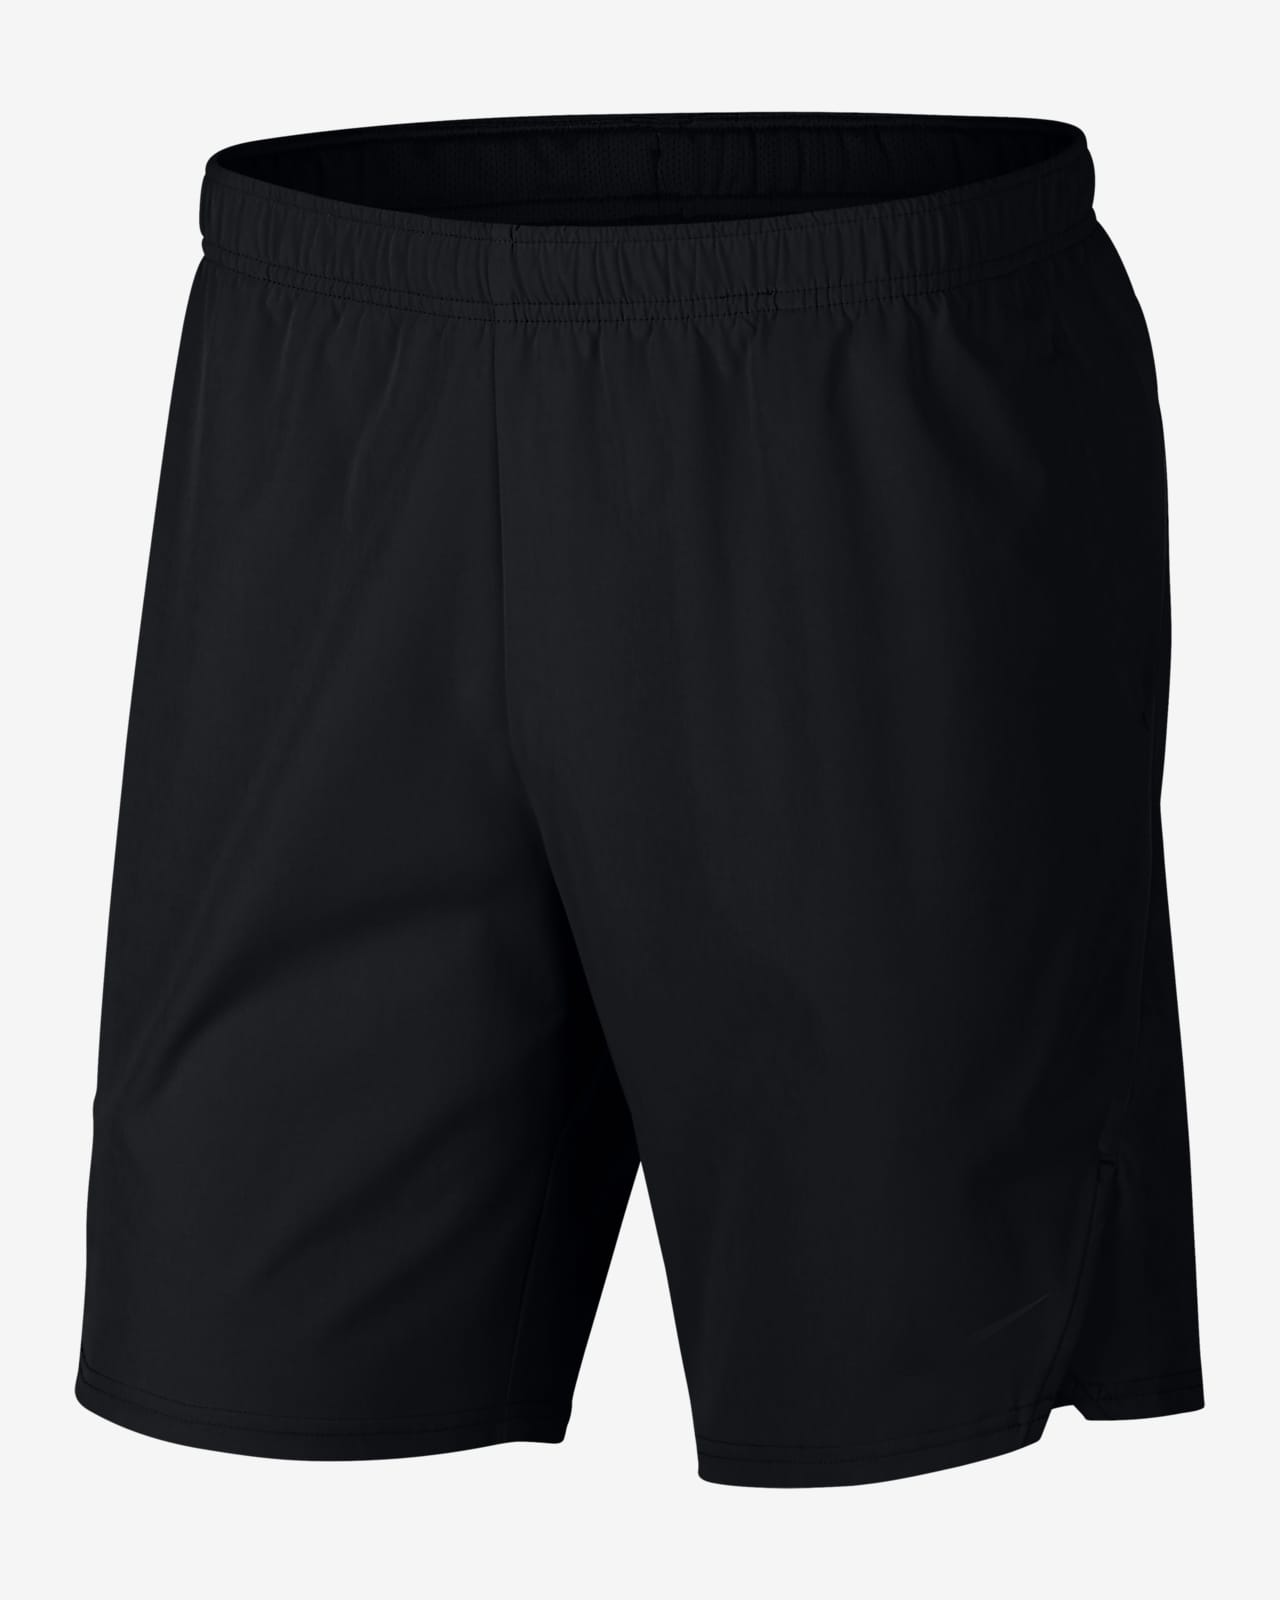 NikeCourt Flex Ace 男子网球短裤